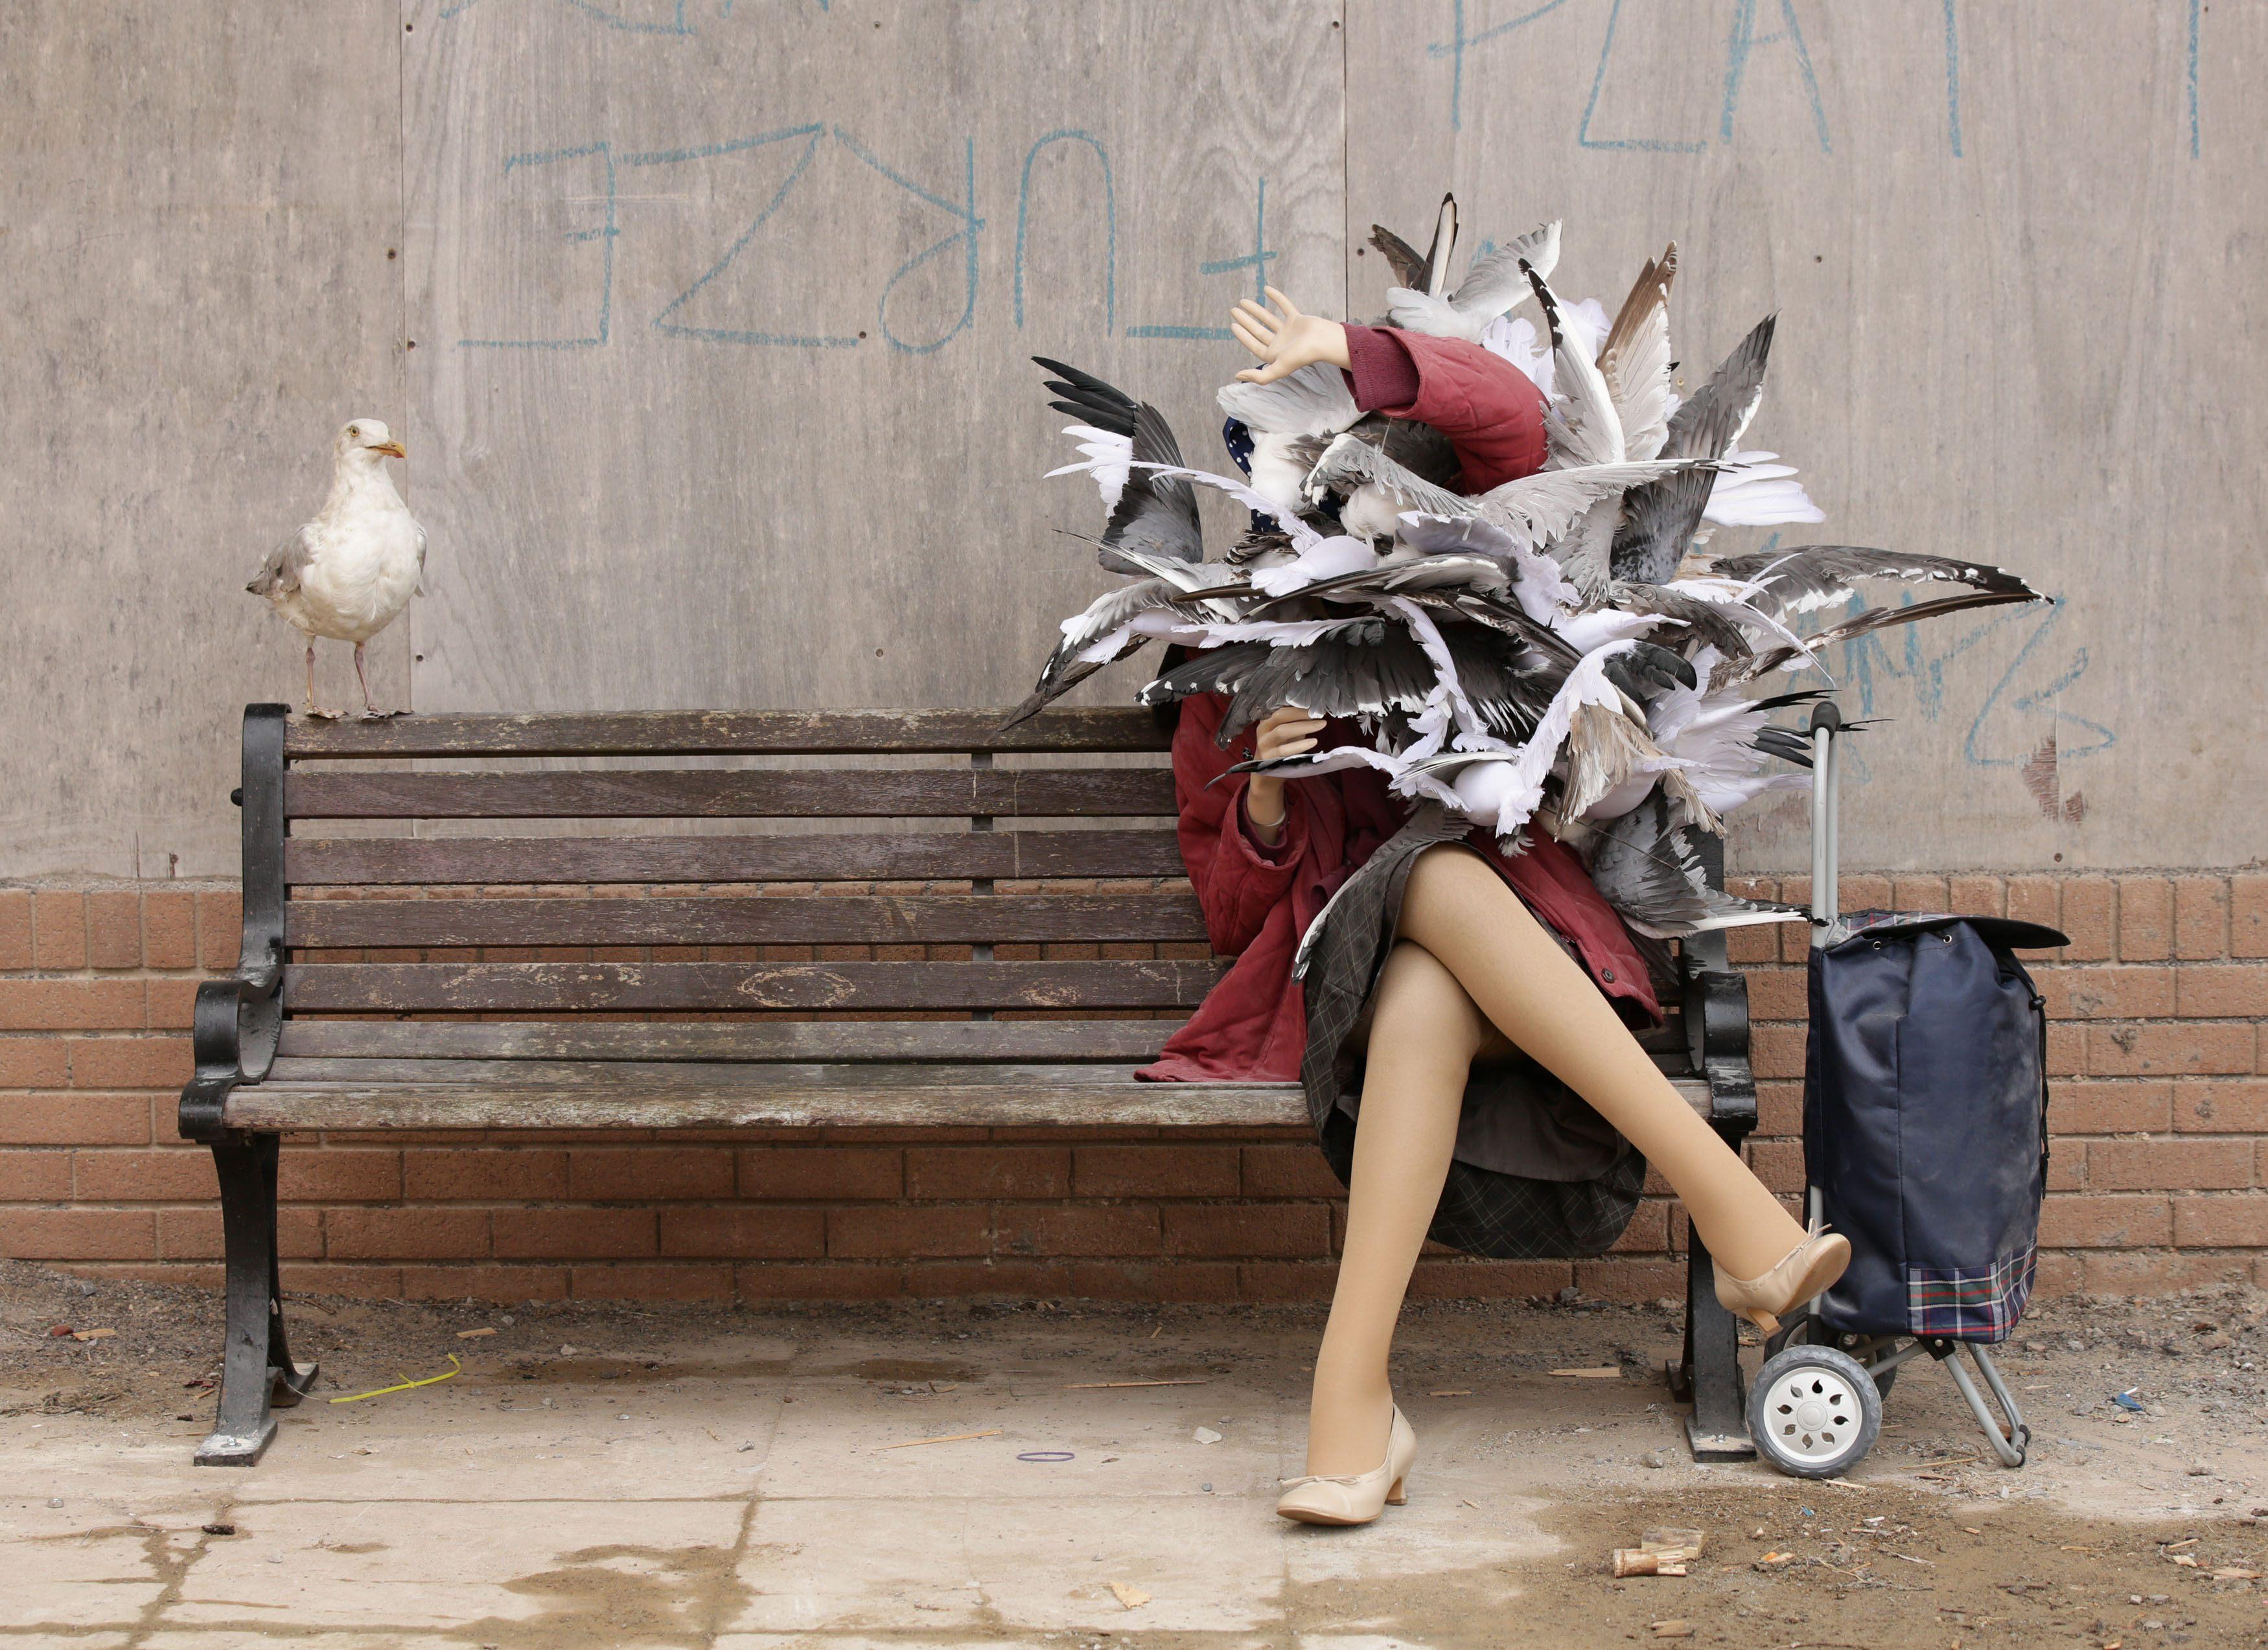 Artist Banksy opens derelict 'Dismaland' theme park ...